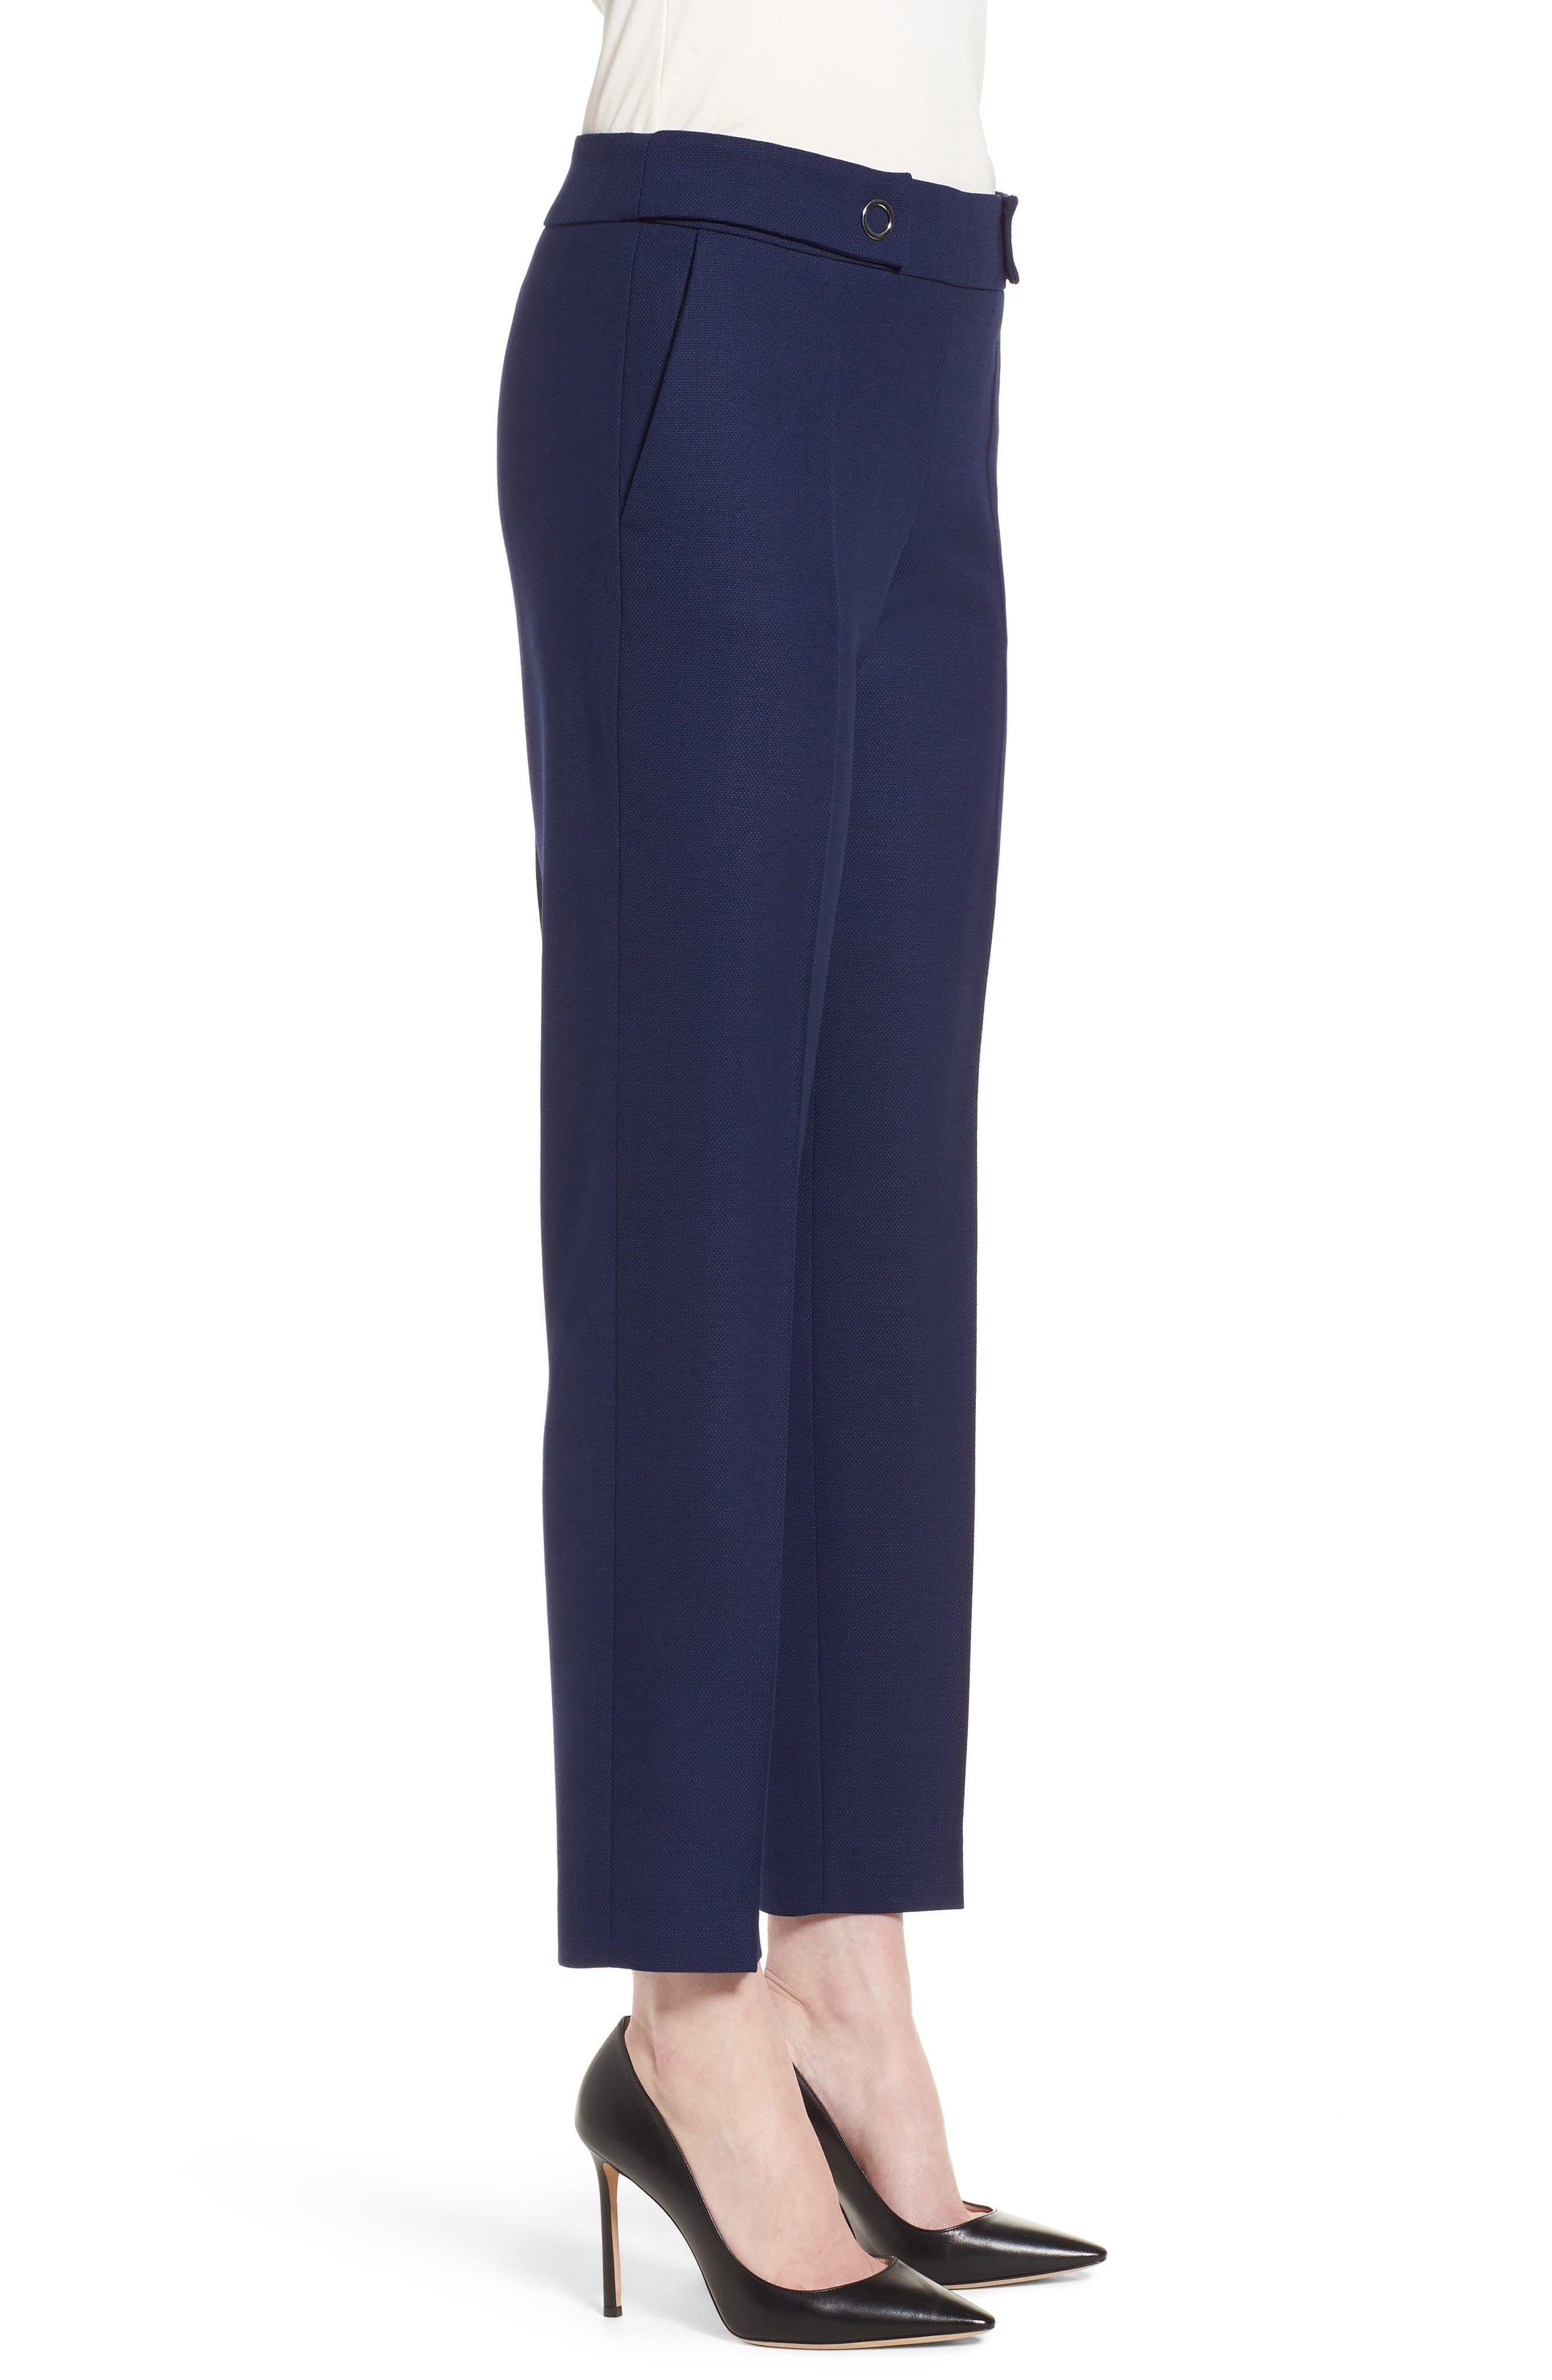 Tibalena Textured Stretch Wool Suit Pants,                             Alternate thumbnail 3, color,                             425